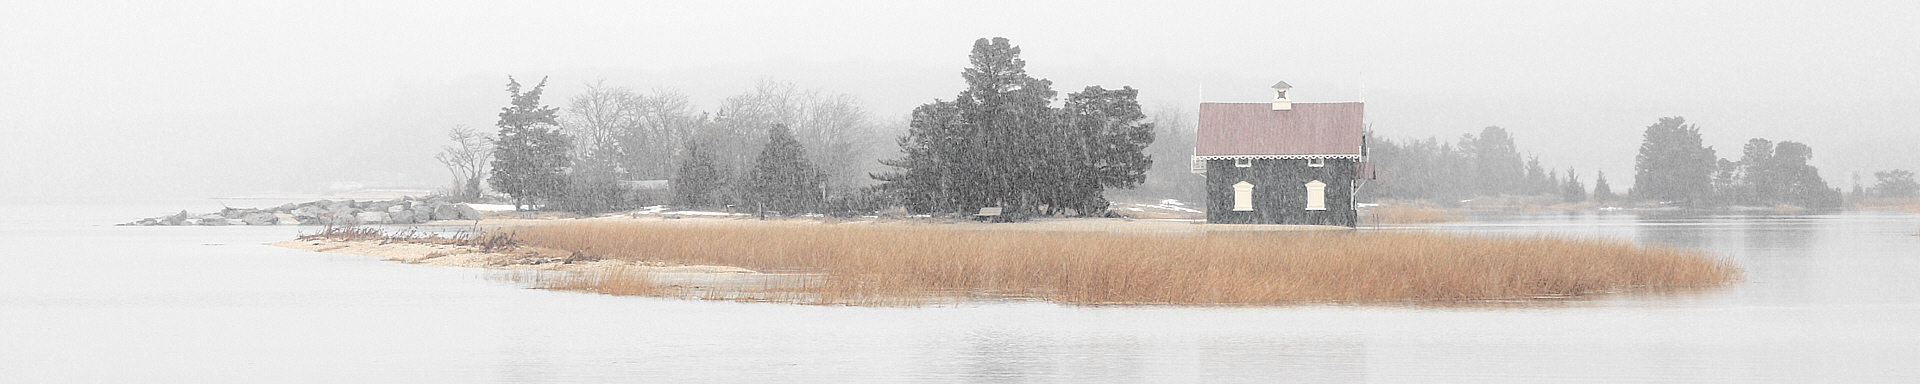 Gamecock Cottage Snowfall.jpg